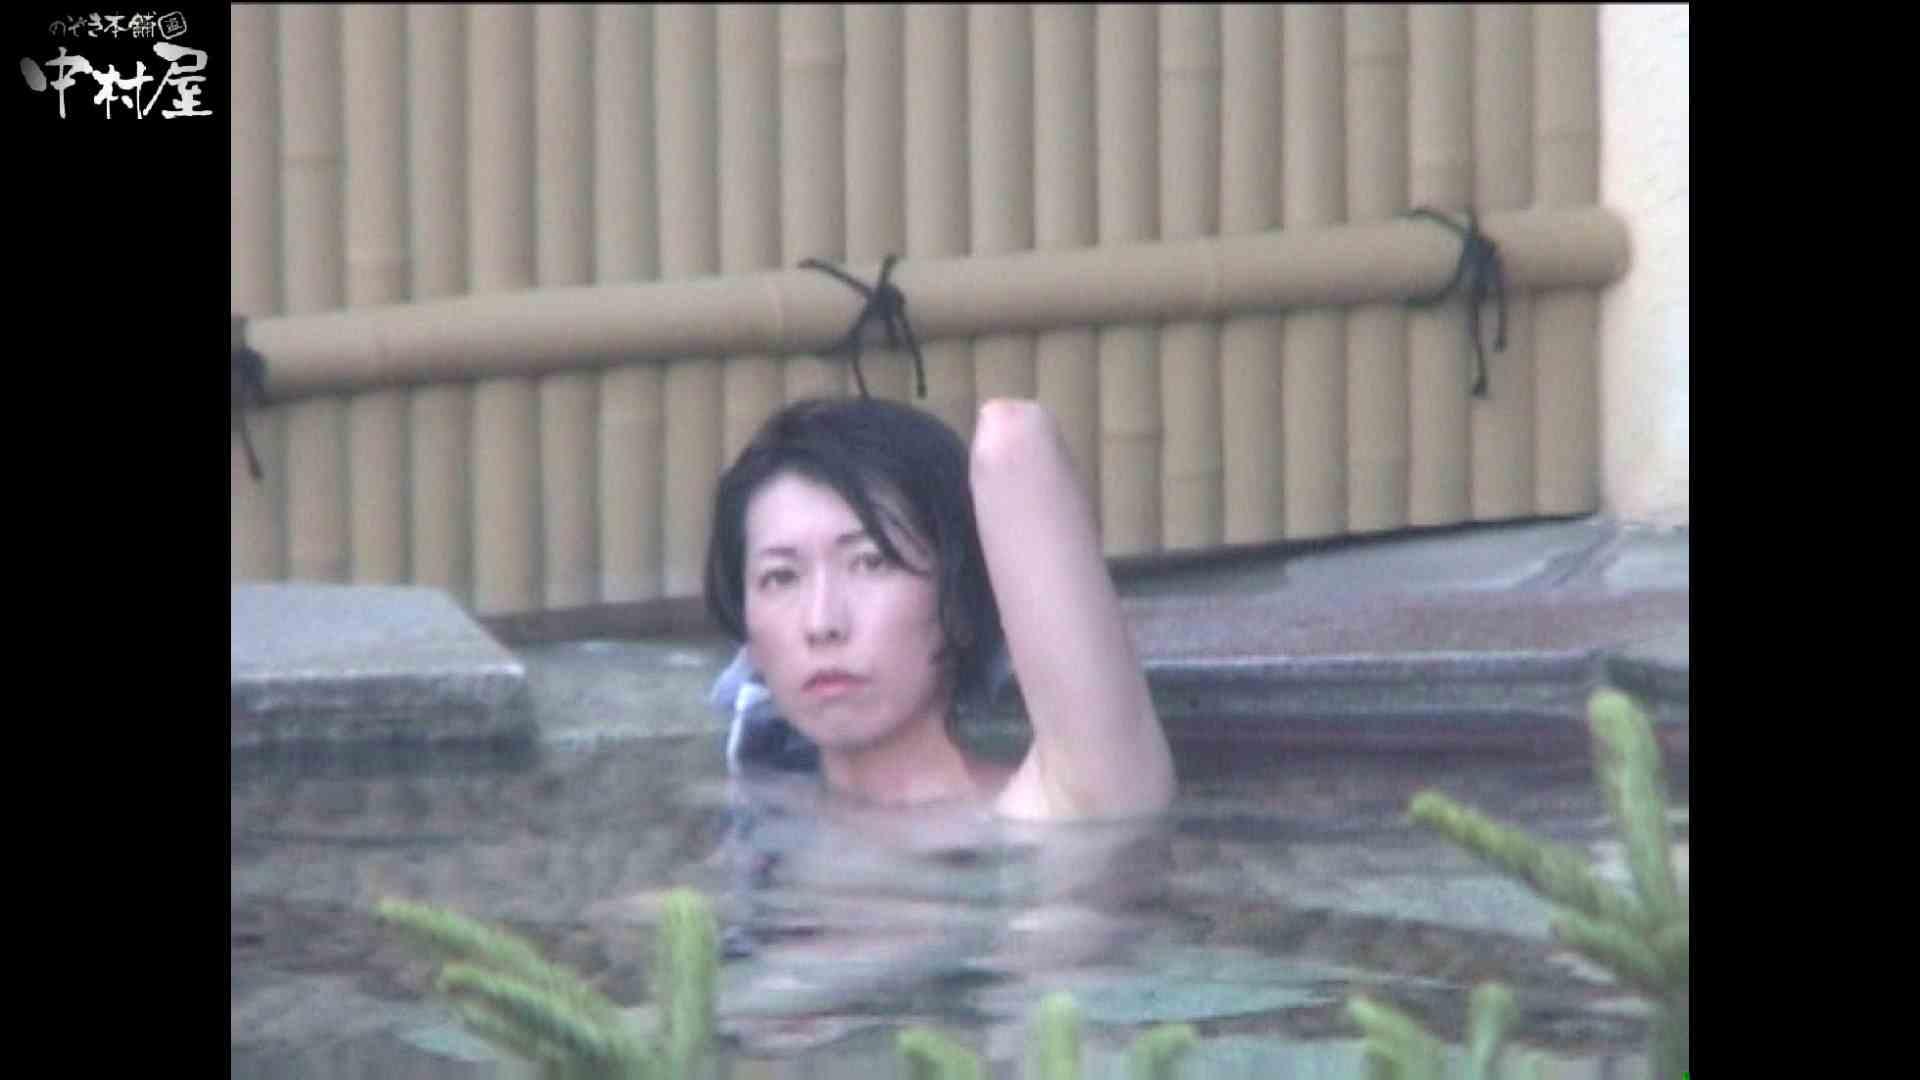 Aquaな露天風呂Vol.987 盗撮シリーズ | 露天風呂編  88PIX 15